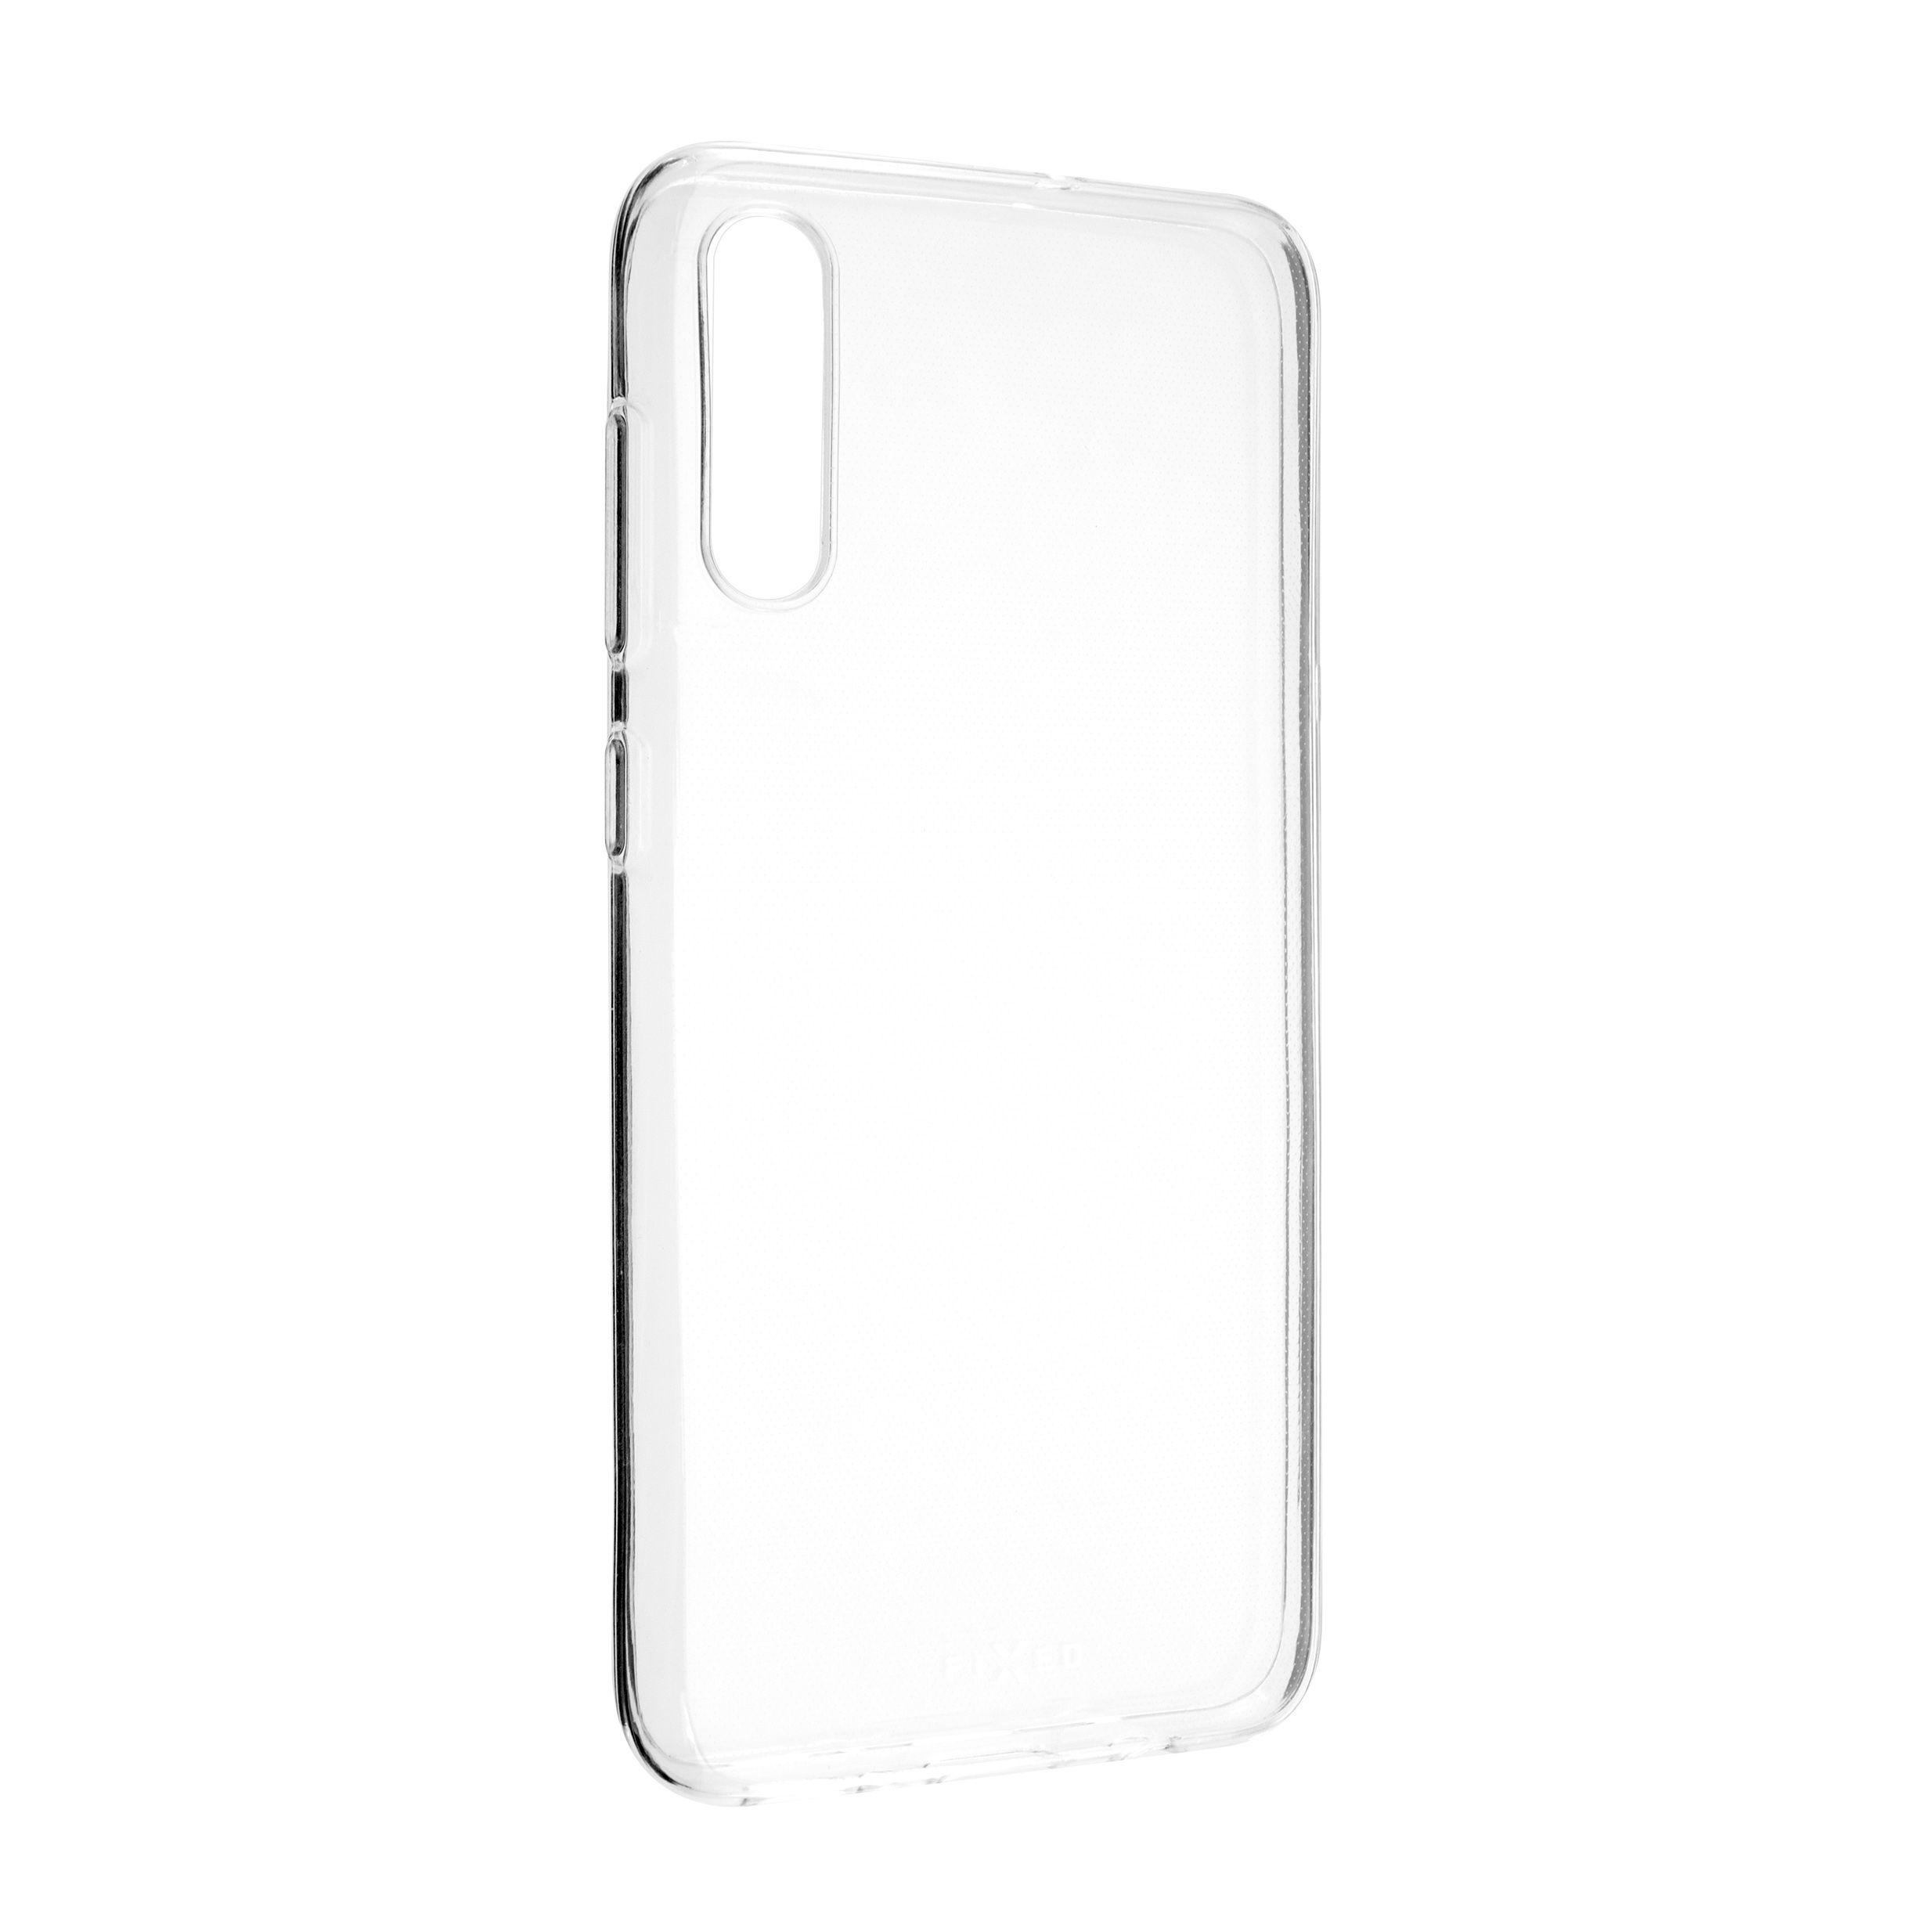 Ultratenké TPU gelové pouzdro FIXED Skin pro Samsung Galaxy A70/A70s, 0,6 mm, čiré